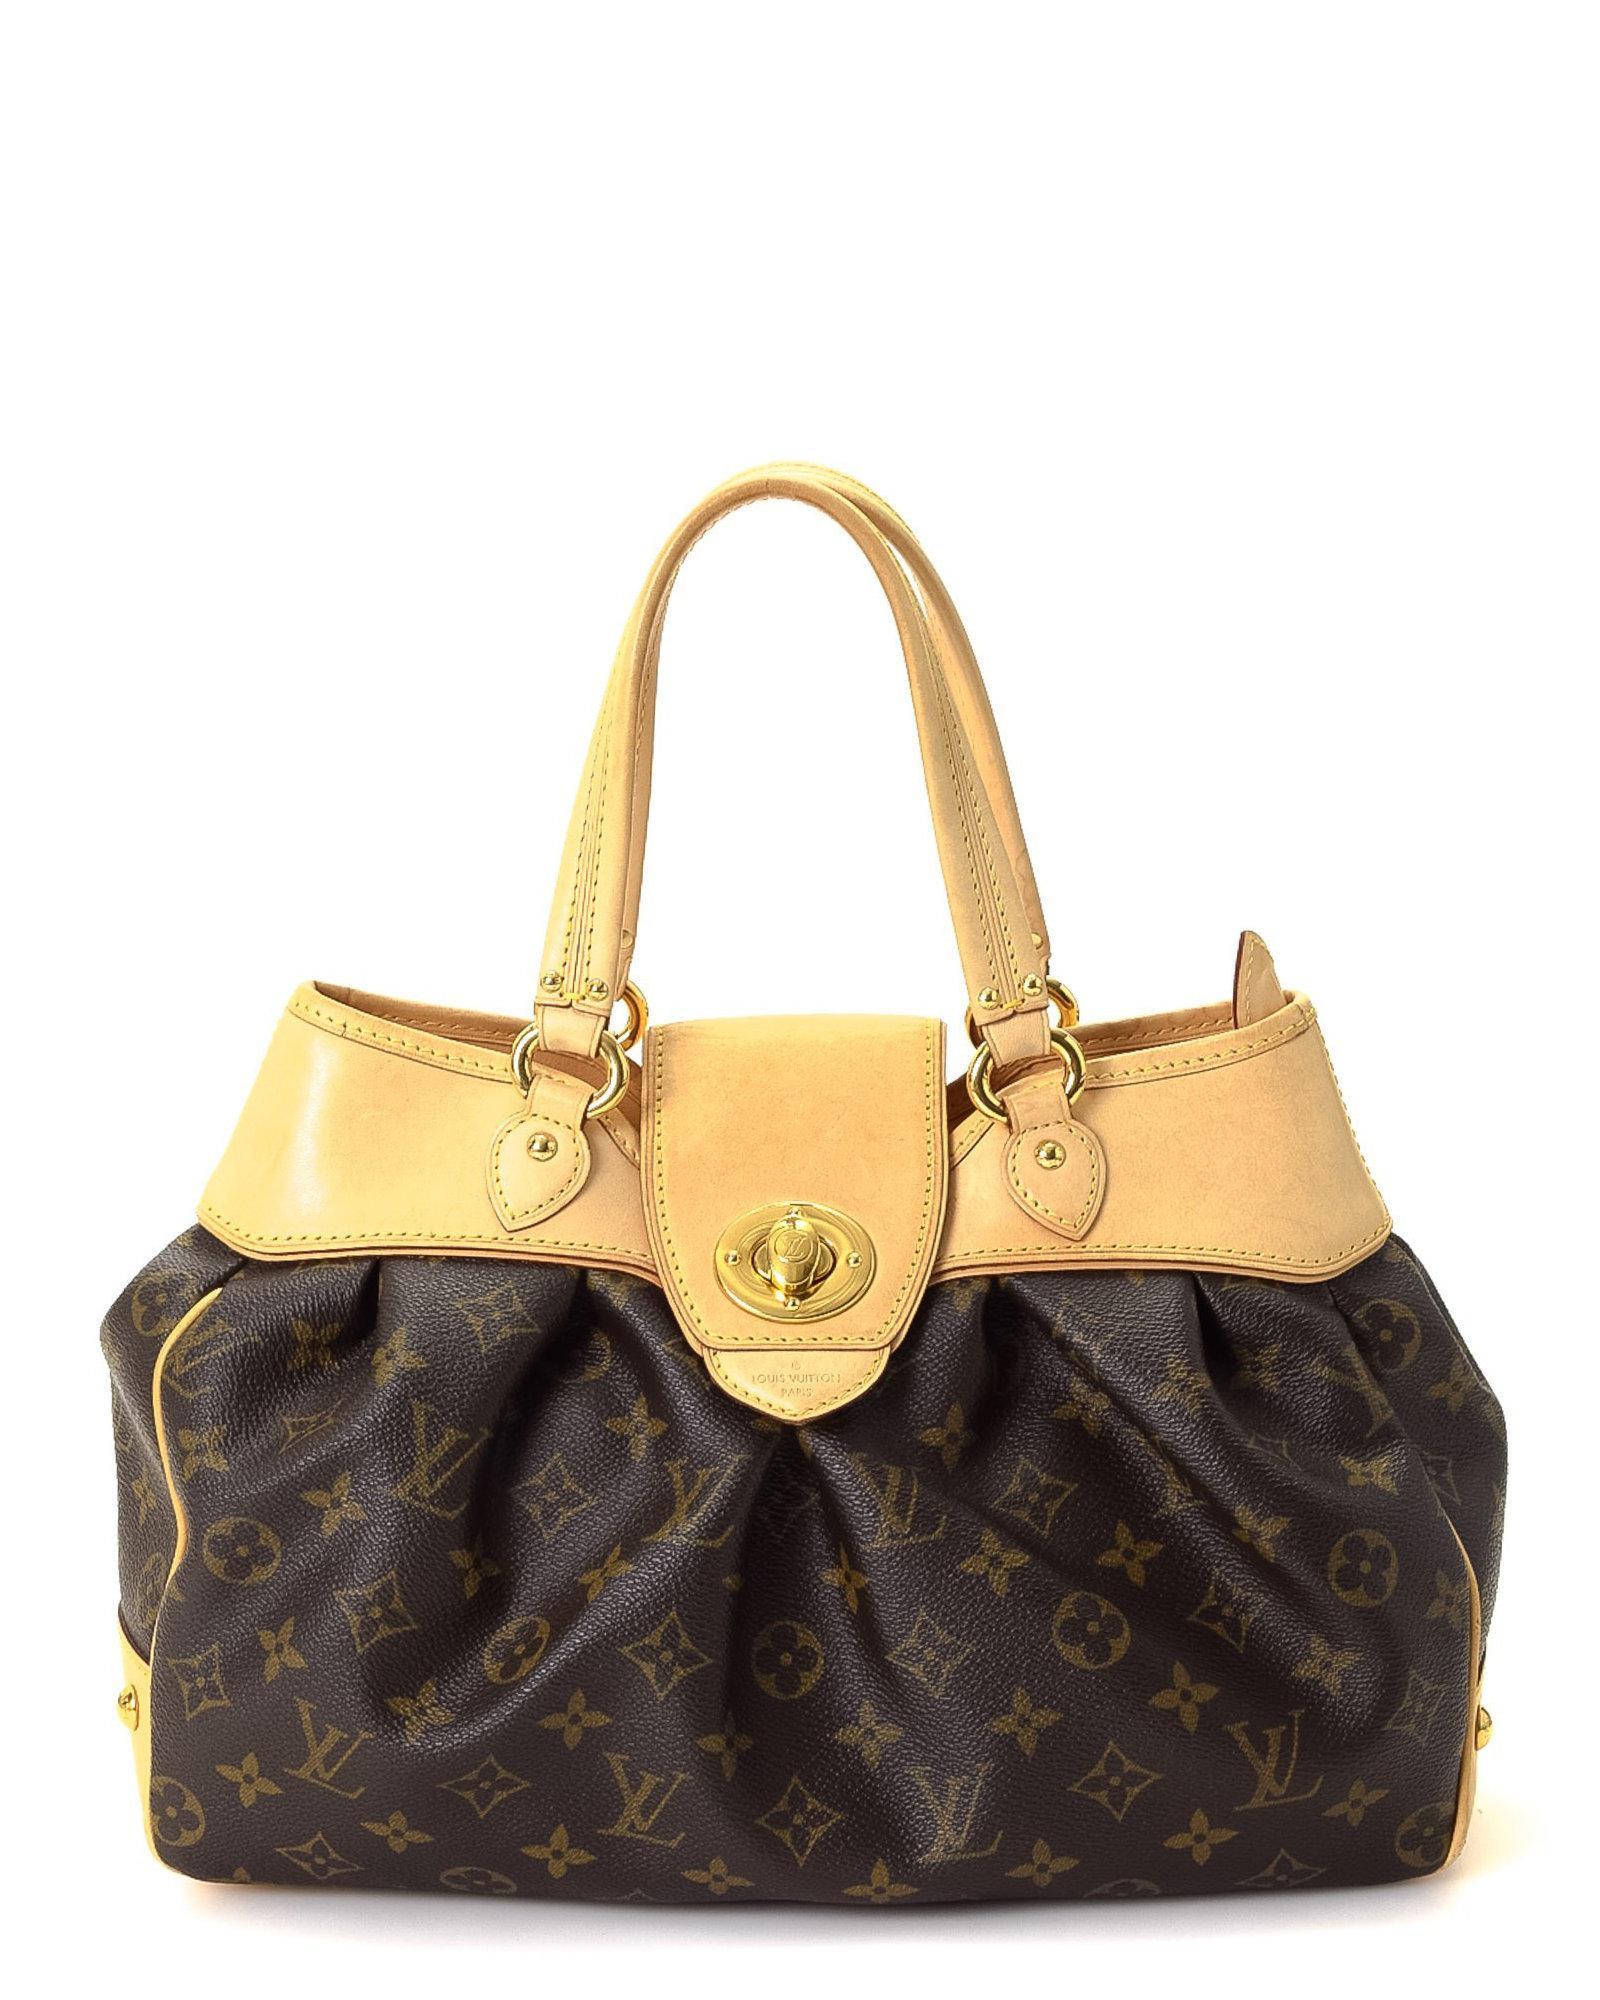 5f86b3469b Lyst - Louis Vuitton Boetie Pm Handbag - Vintage in Brown